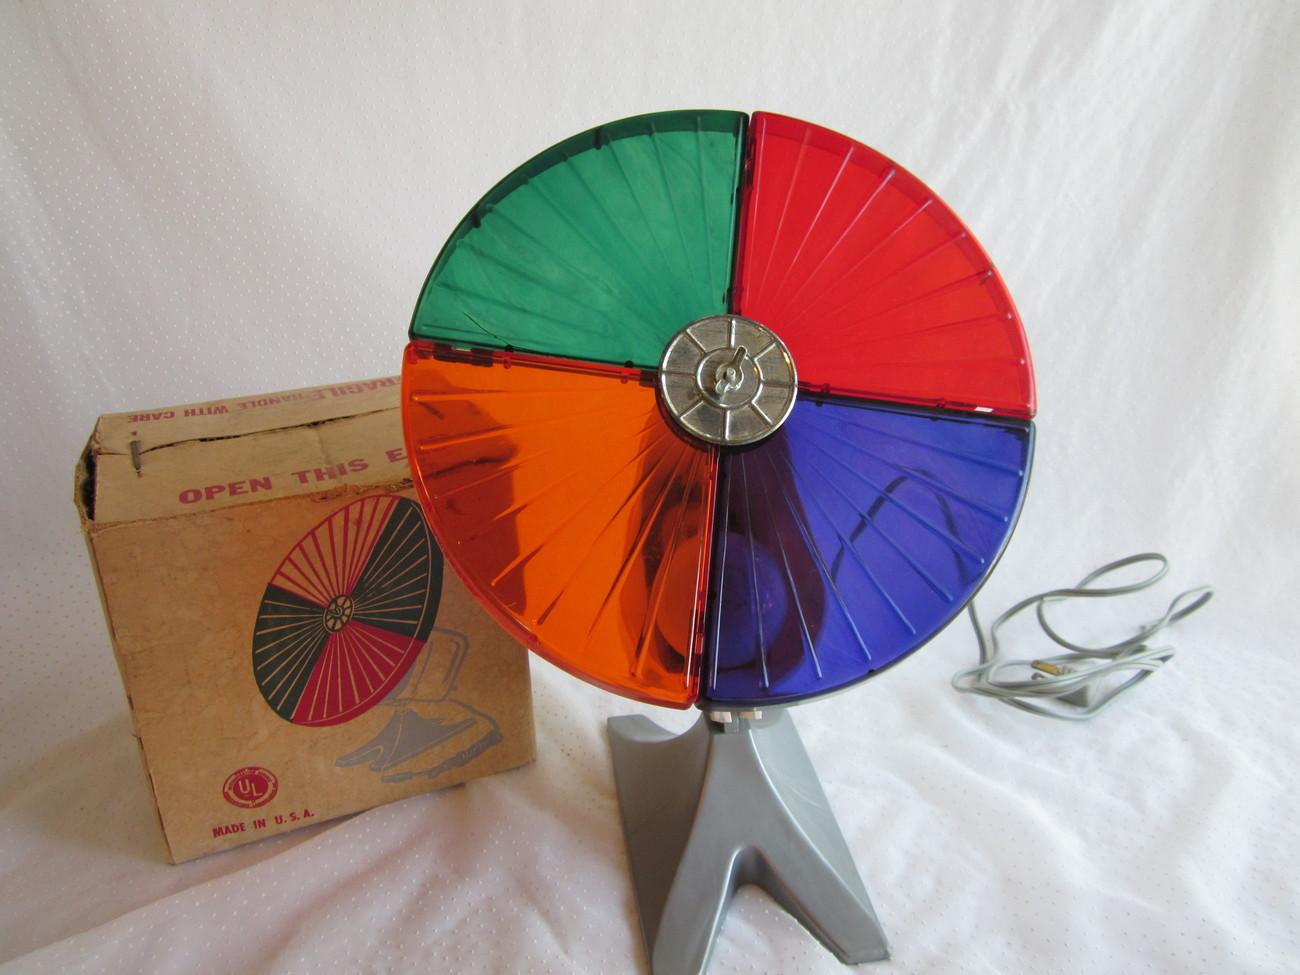 Colortone Roto Wheel Snapit Vintage Aluminum Tree Light 4 Colors